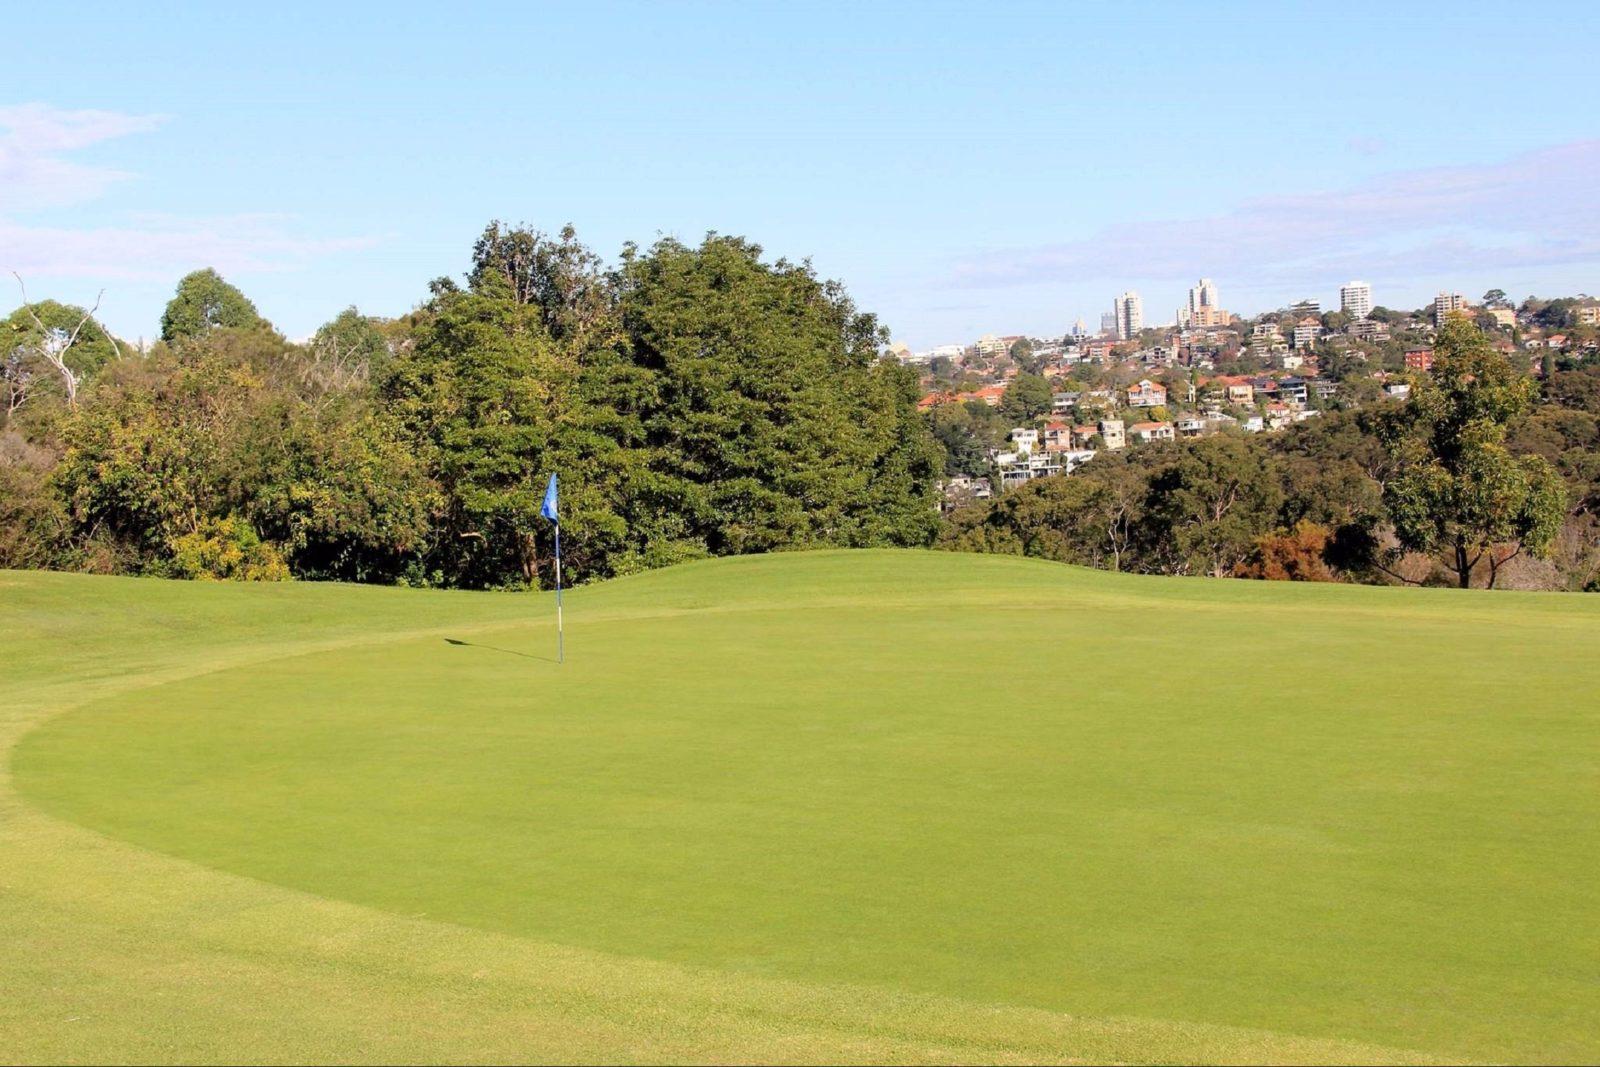 Collier Park Golf Course, Perth, Western Australia